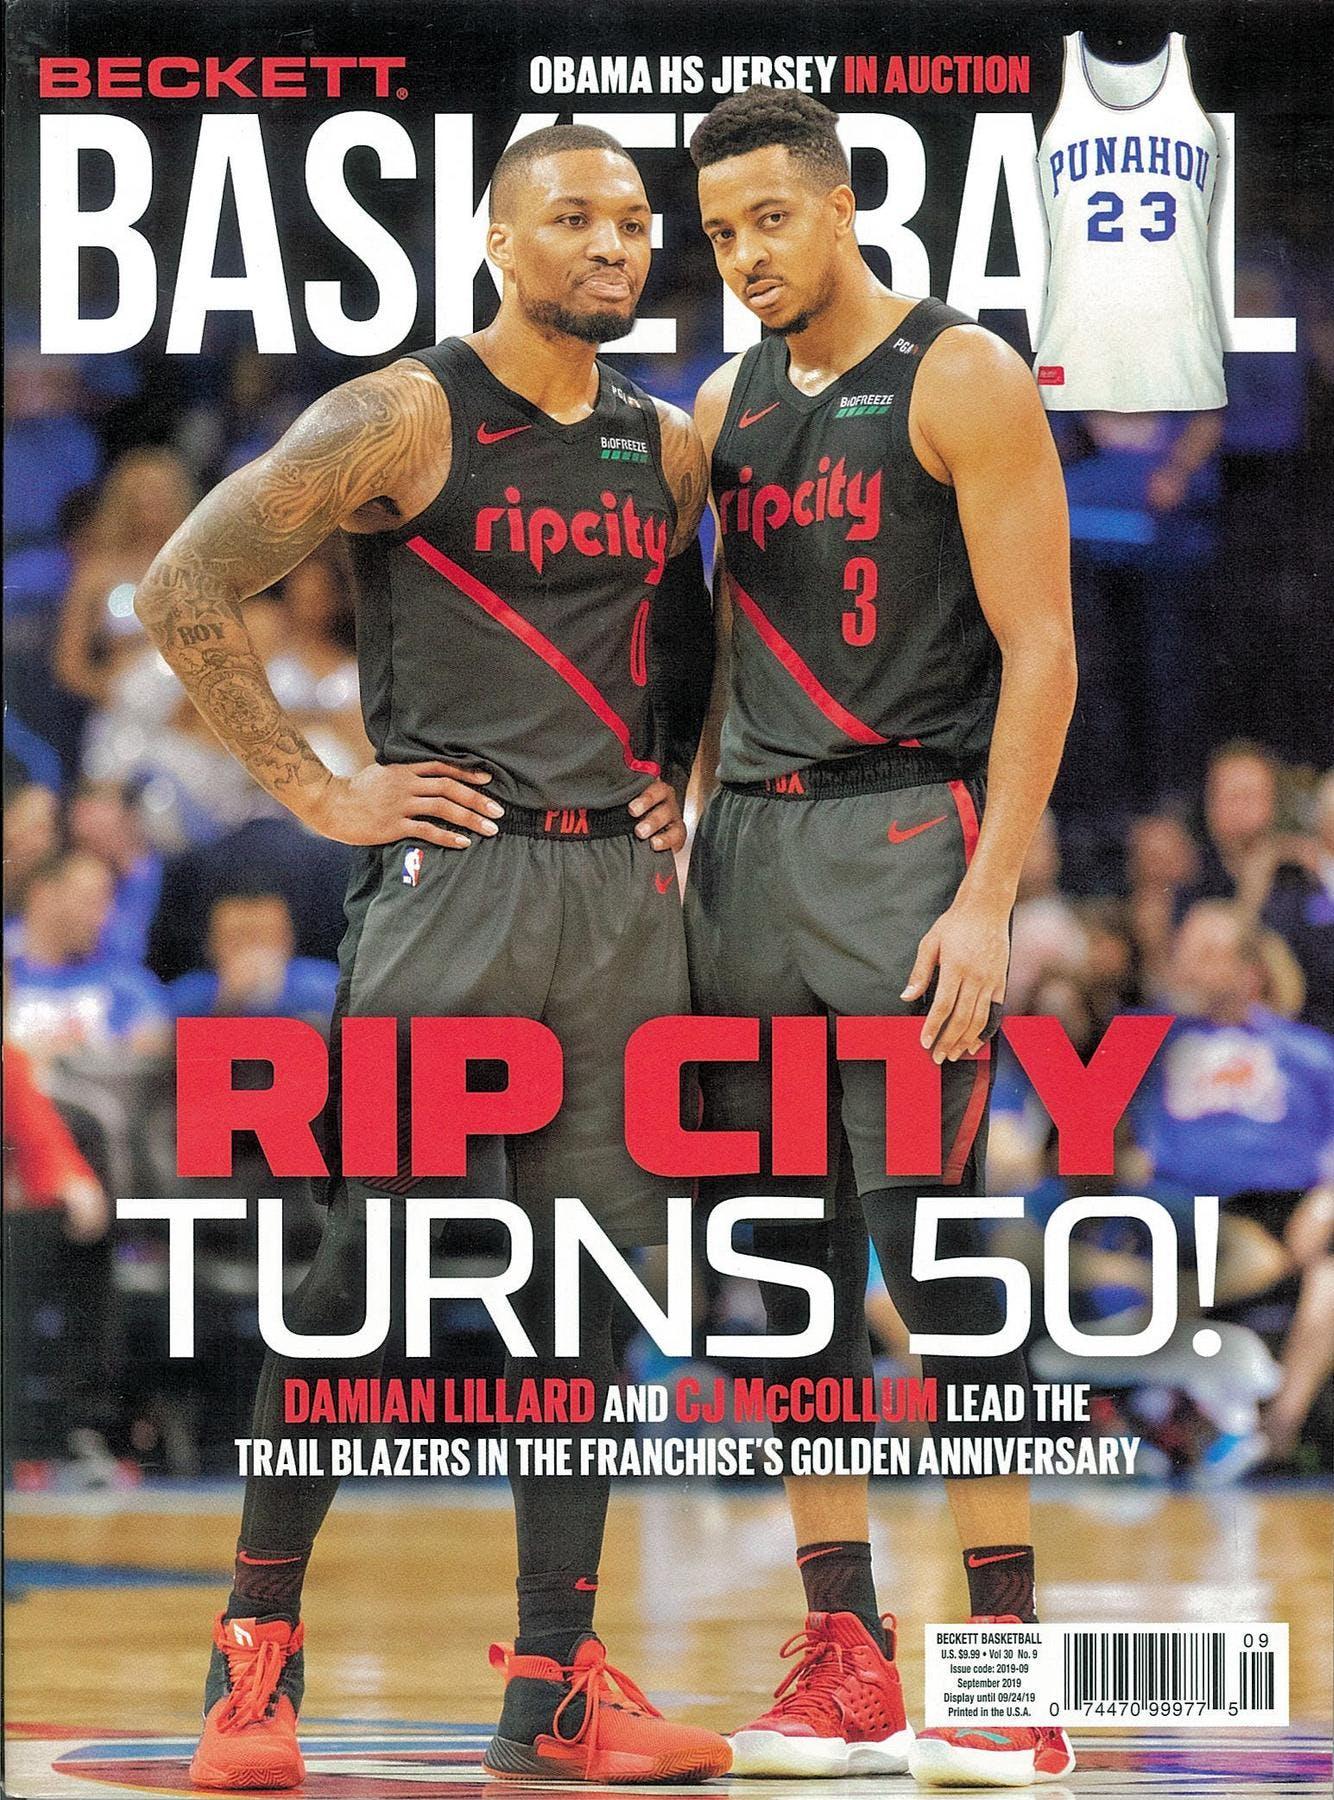 2019 Beckett Basketball Monthly Price Guide 324 September Rip City